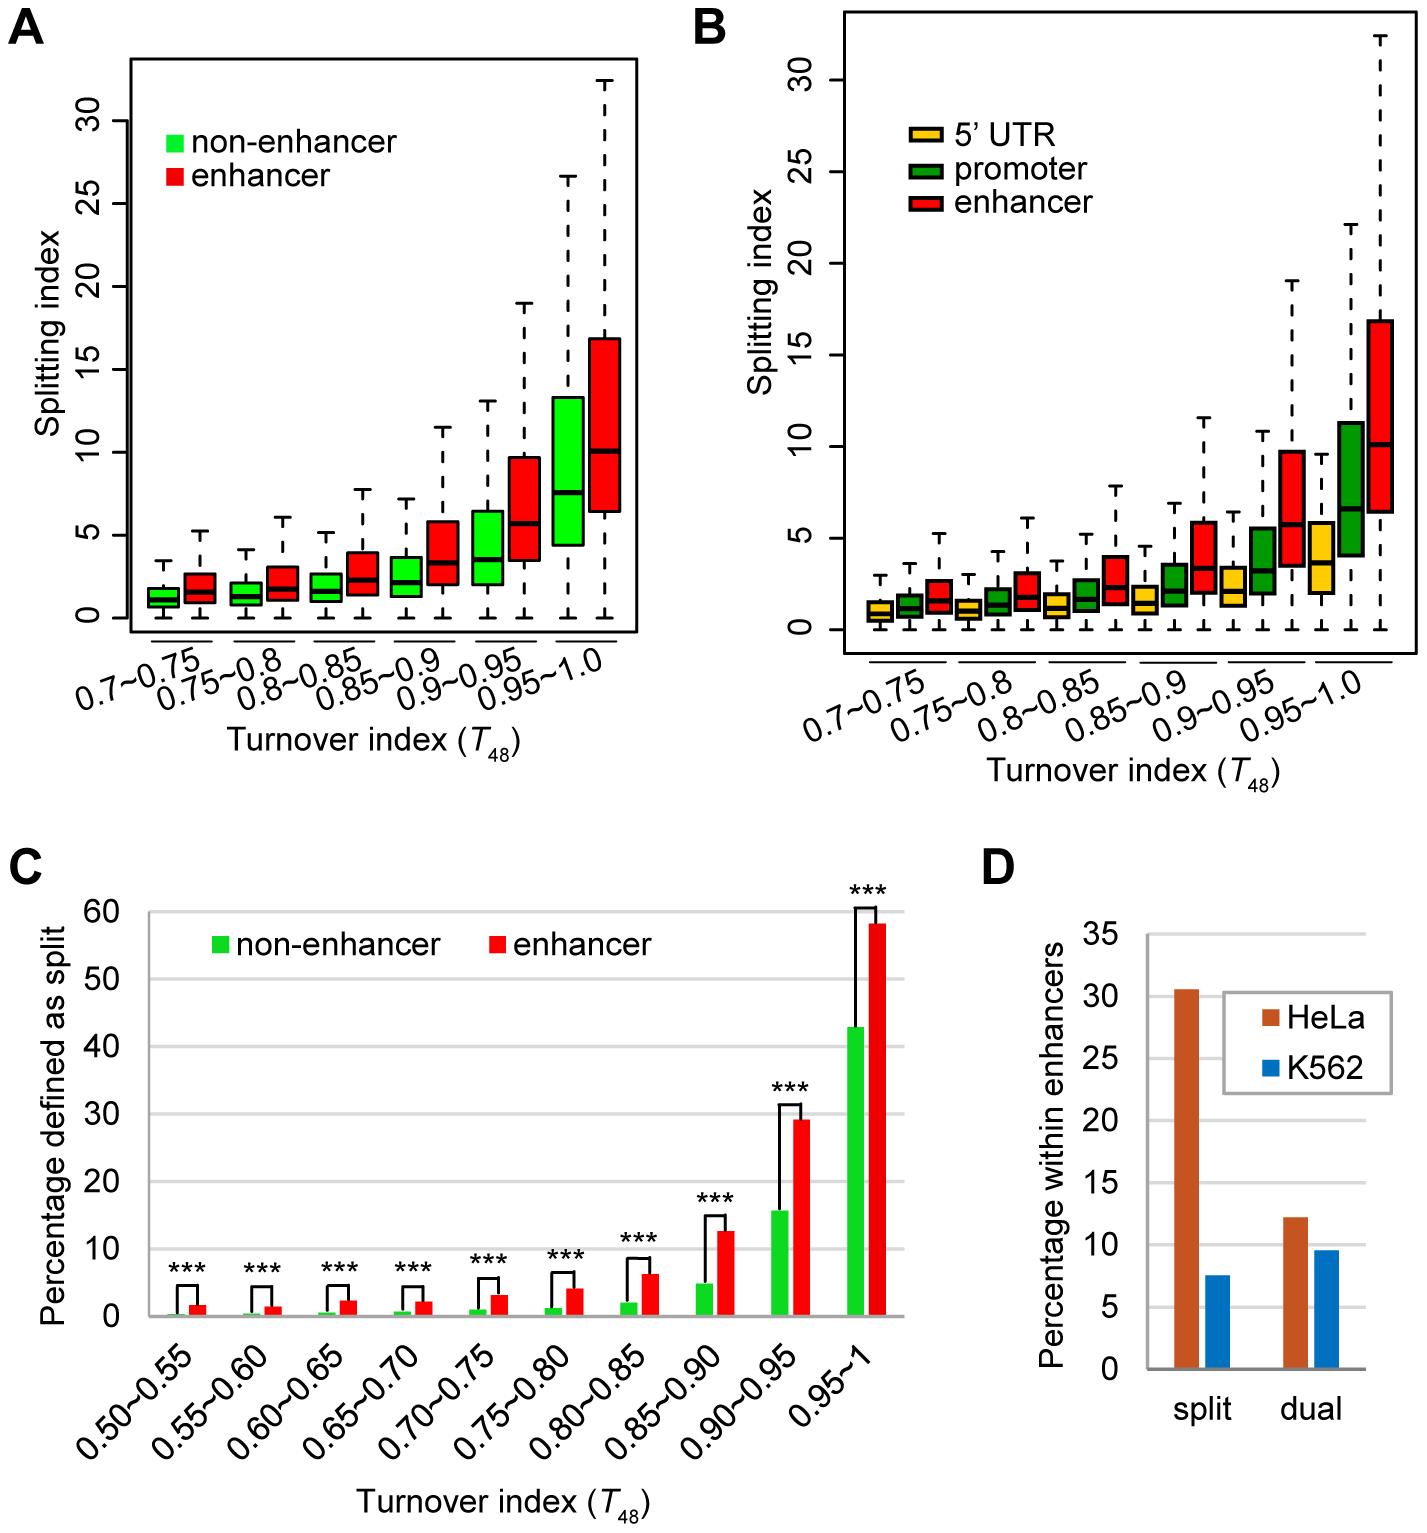 The enhancer H3.3 nucleosomes display higher splitting index than the non-enhancer H3.3 nucleosomes.